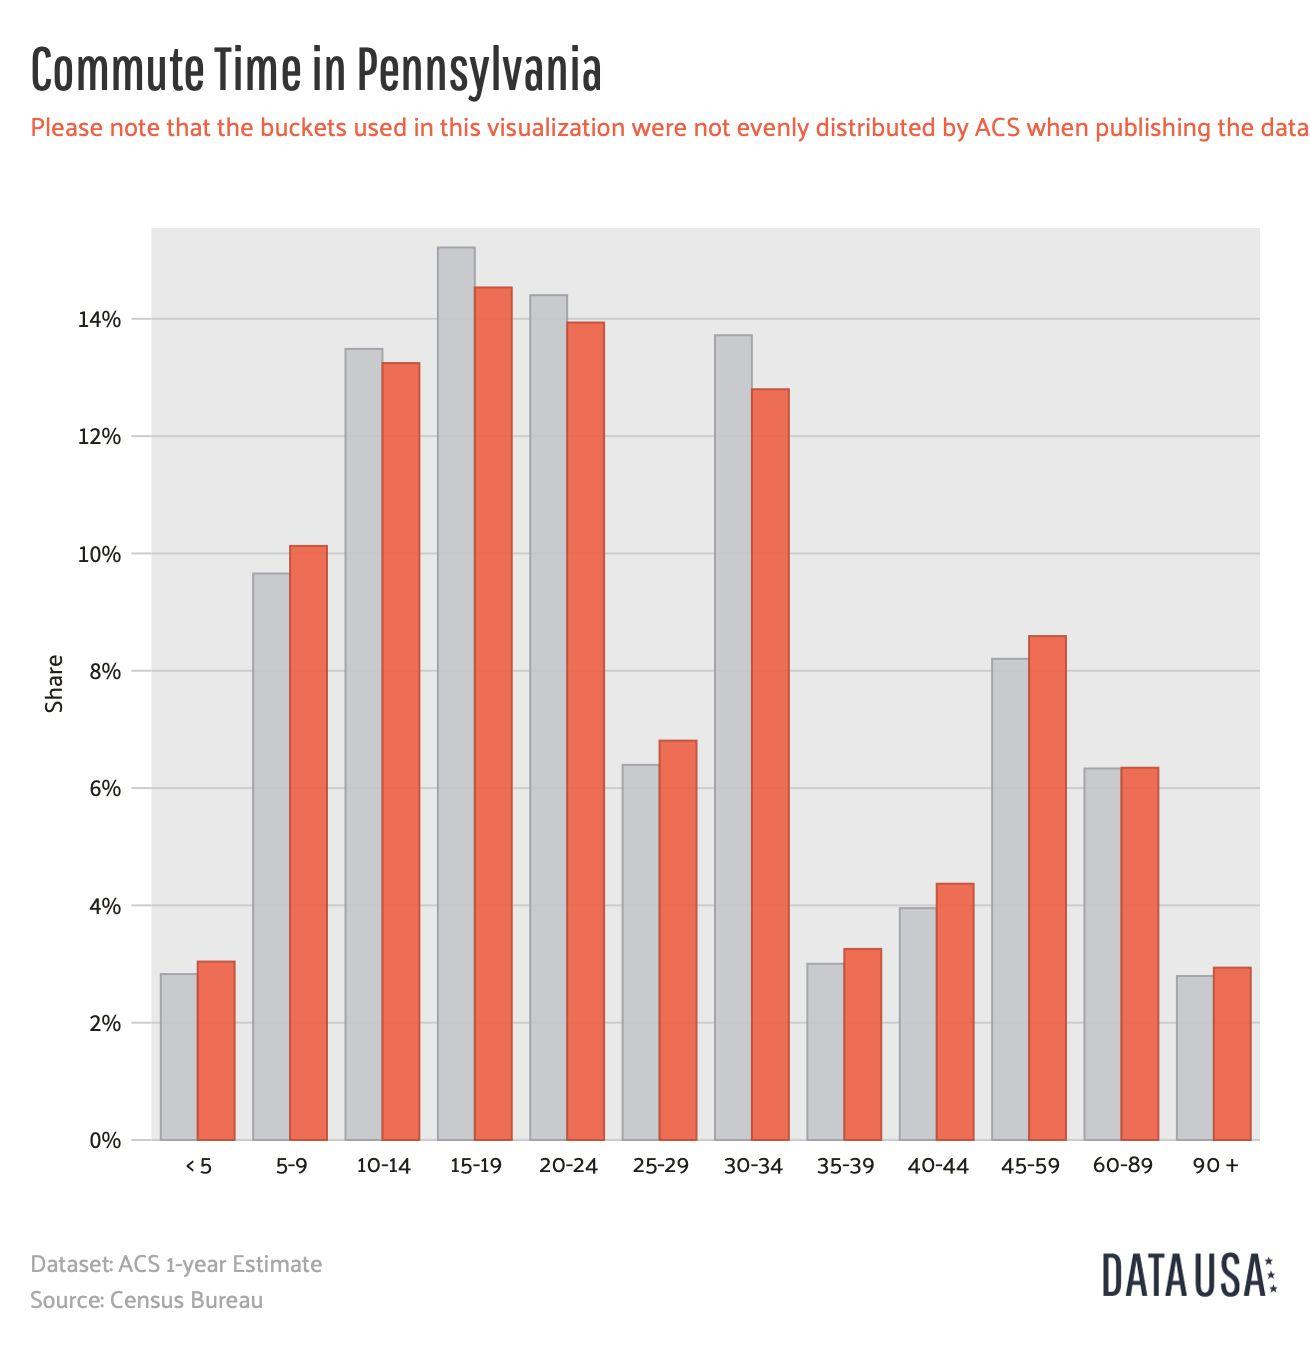 Pennsylvania Commute Time